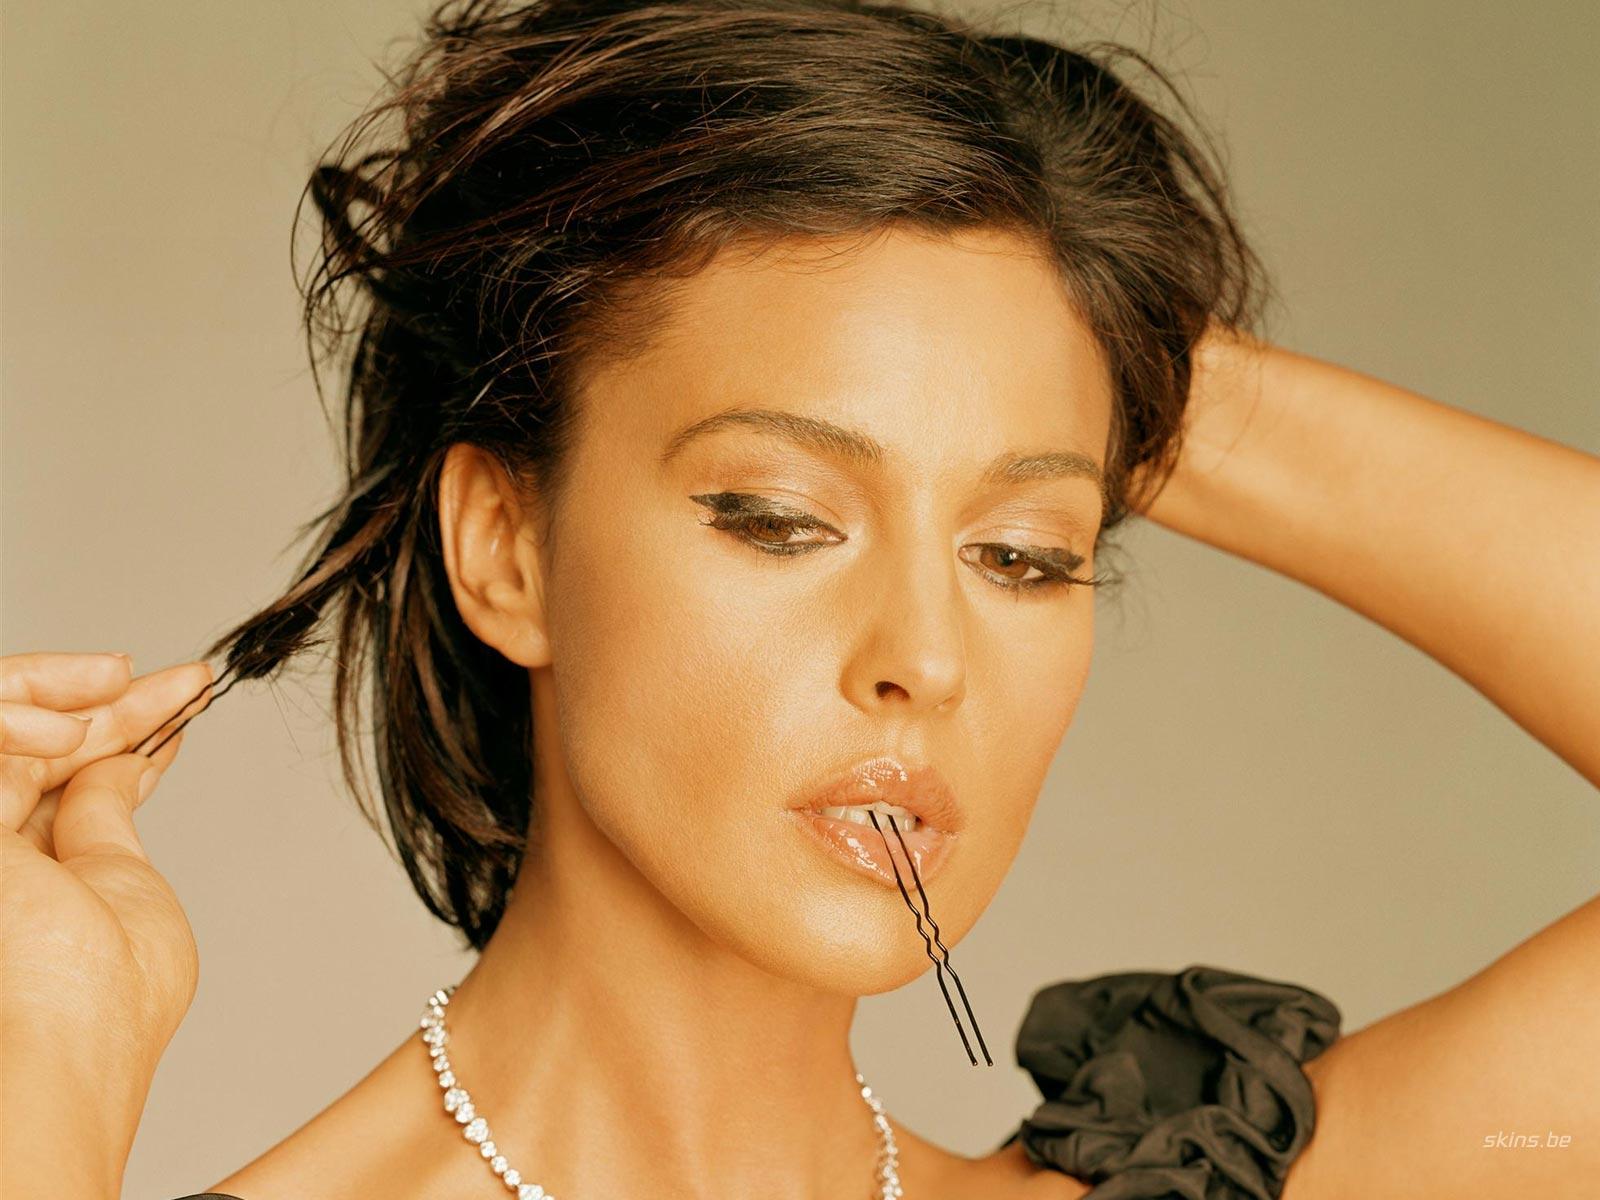 sexy italian actress monica bellucci hot wallpapers